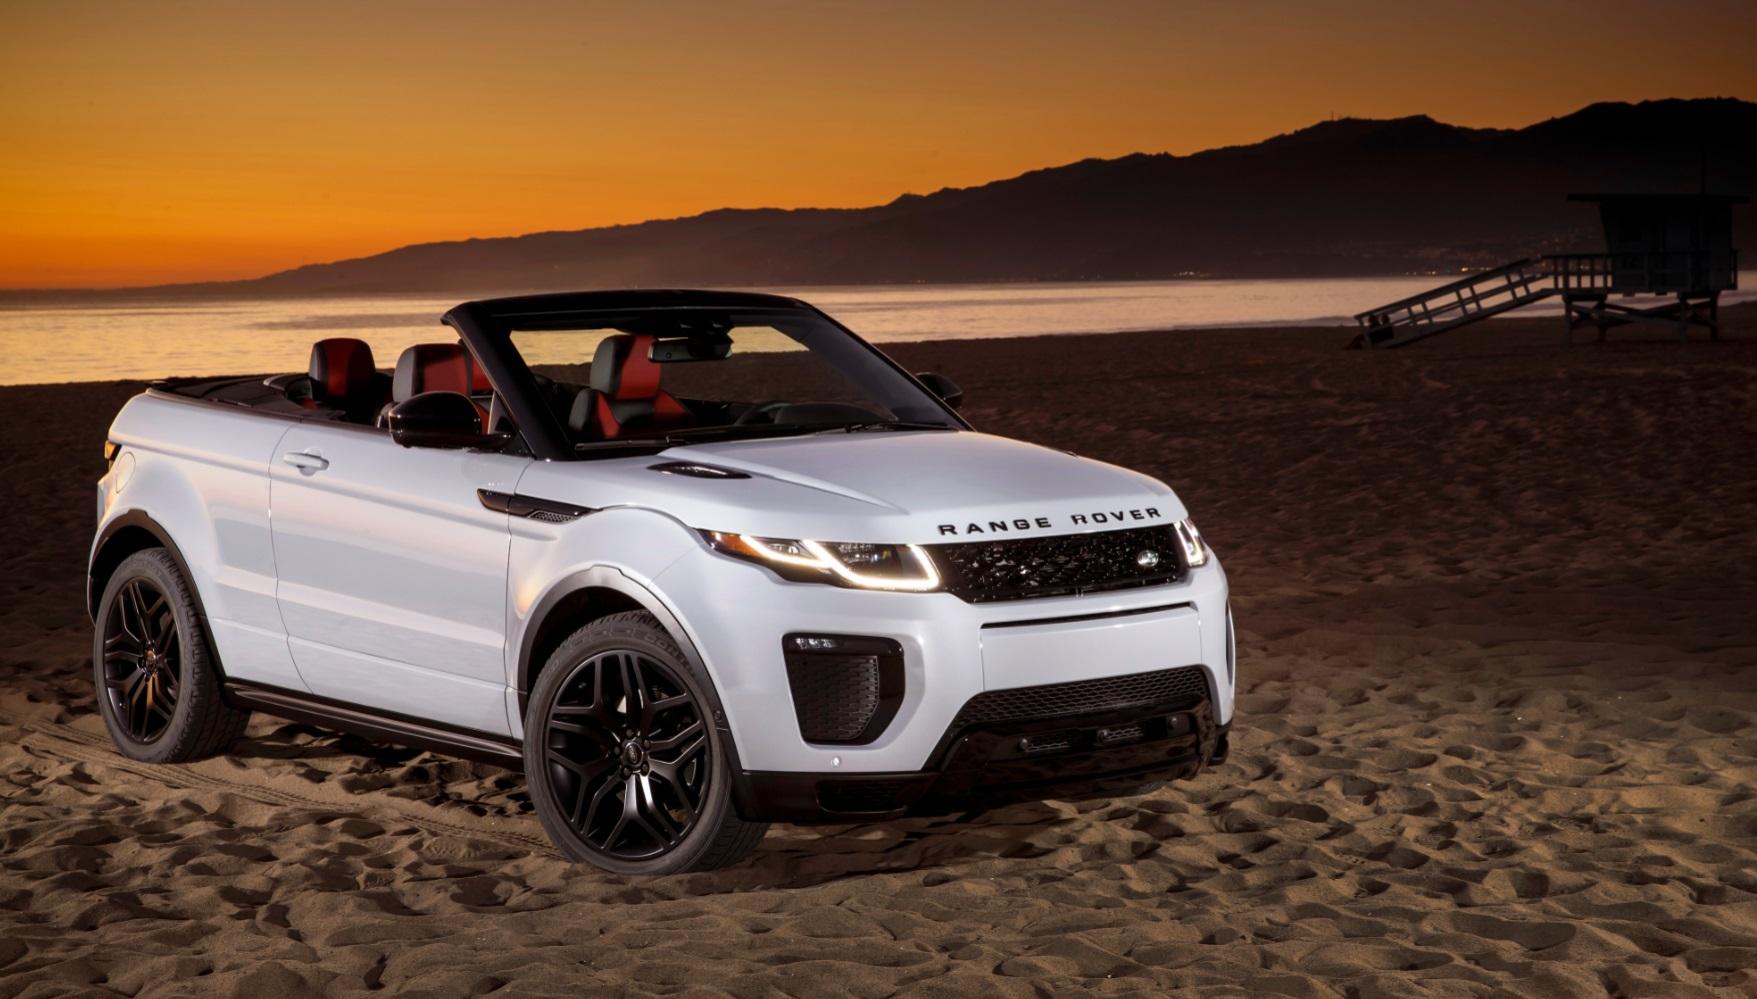 range rover evoque cabriolet la star qui enl ve le haut auto moto magazine. Black Bedroom Furniture Sets. Home Design Ideas